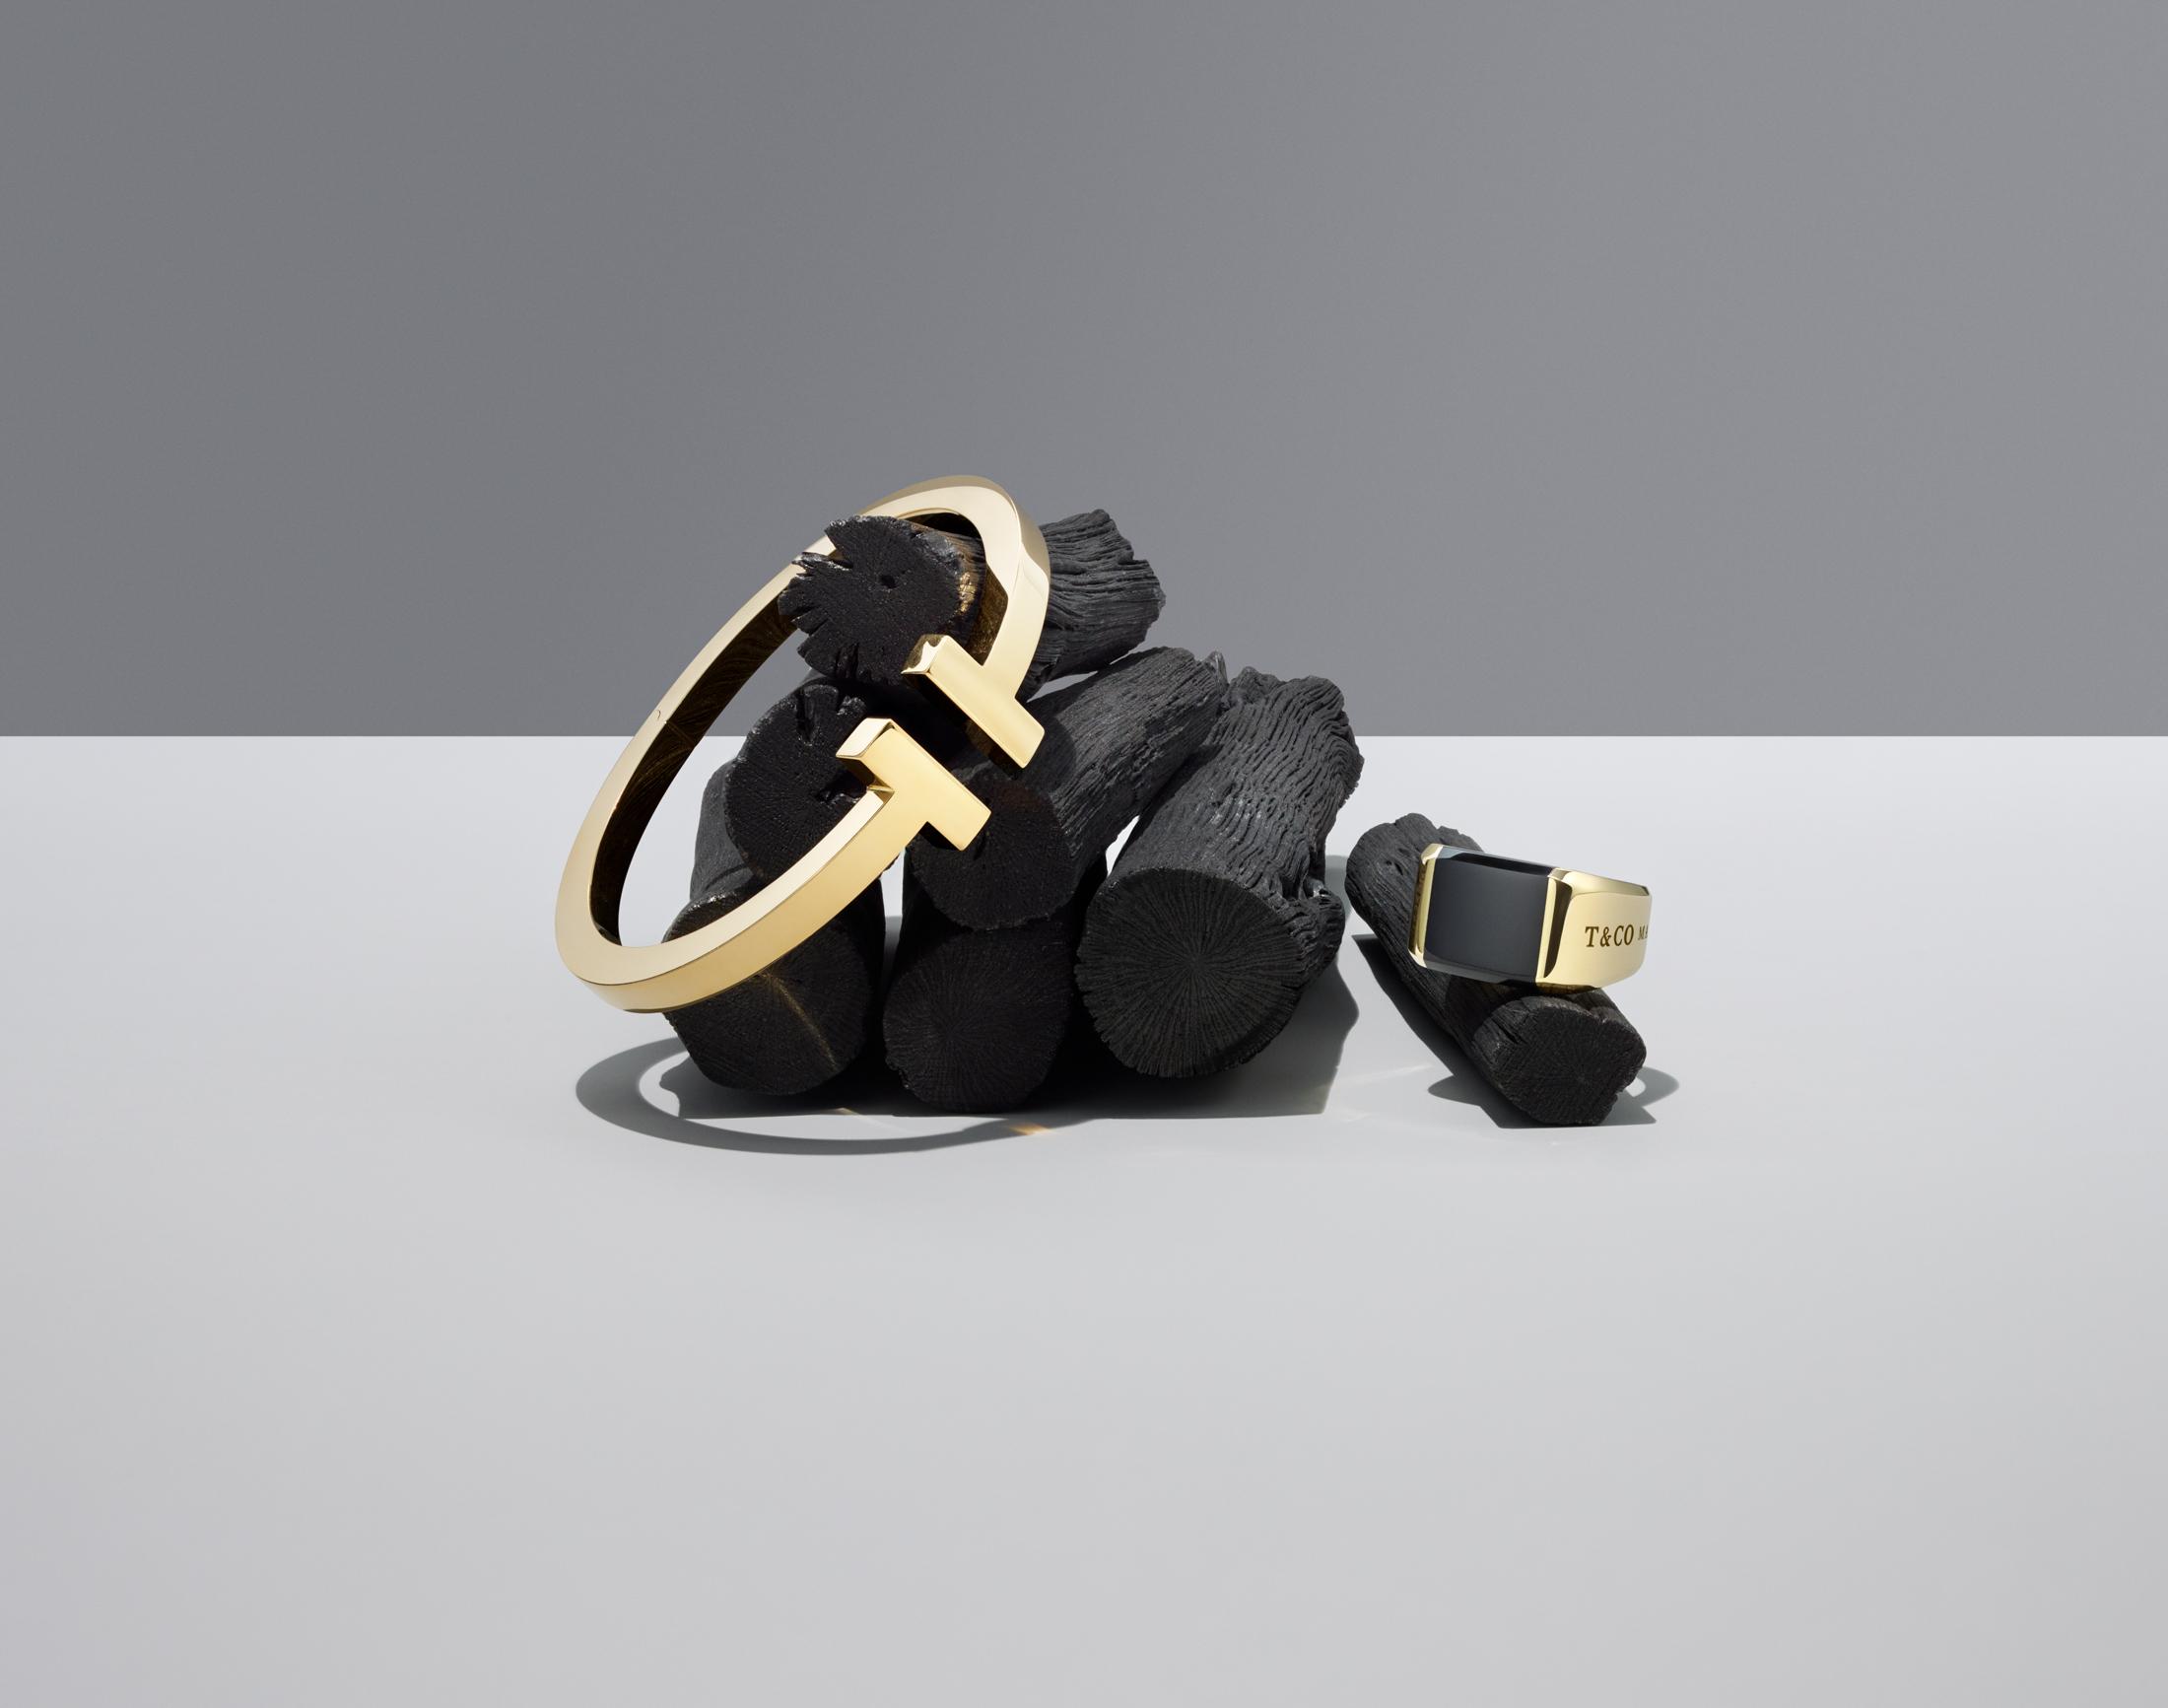 Tiffany Men's Collection creative shoot by Darrin Haddad